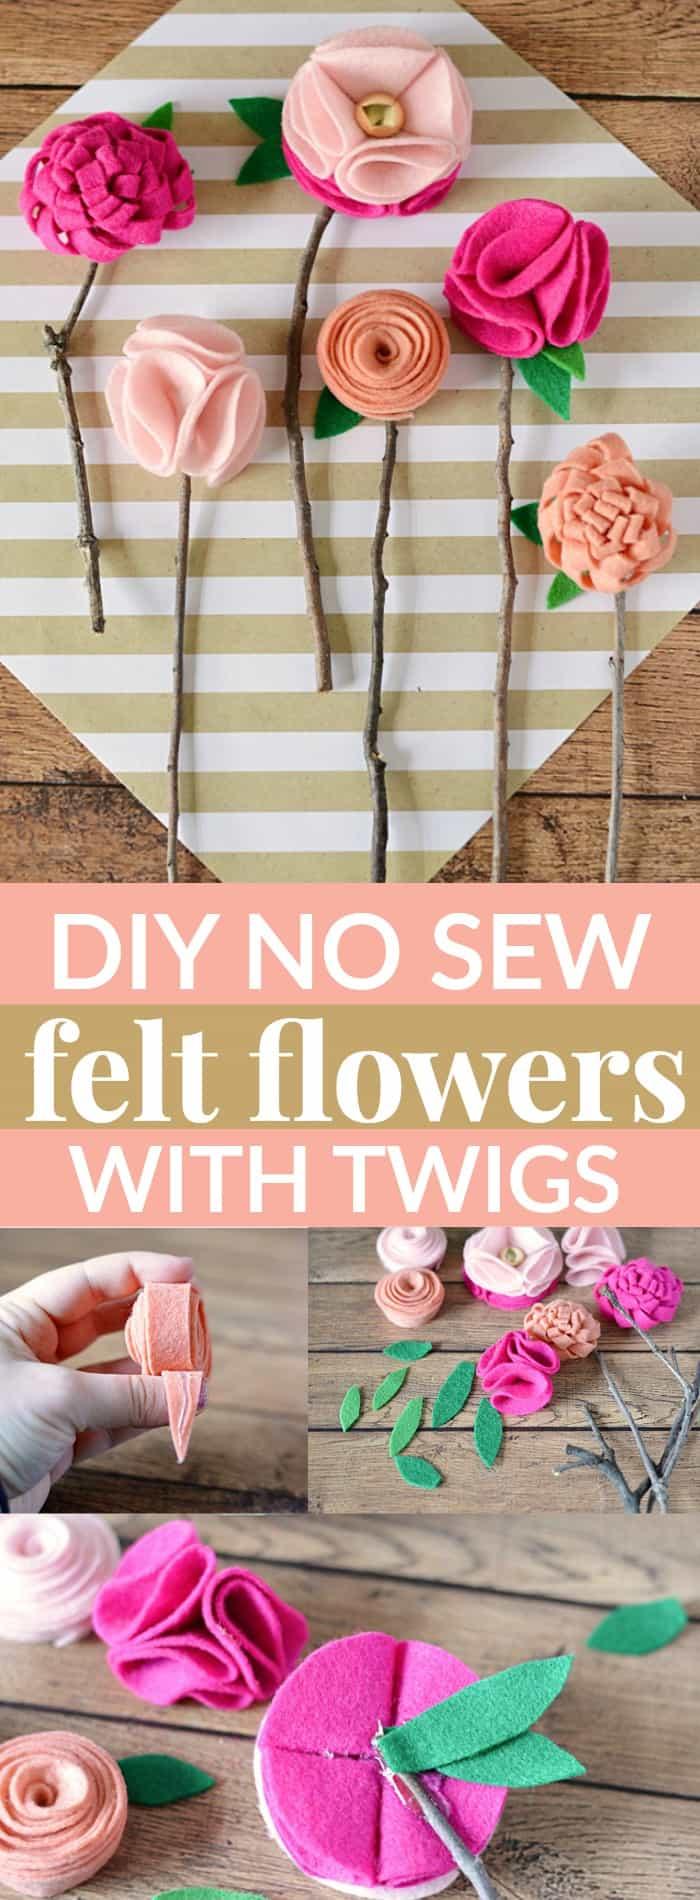 Beautiful Fun Fall Wedding Inspiration: DIY NO SEW FELT FLOWERS WITH TWIGS